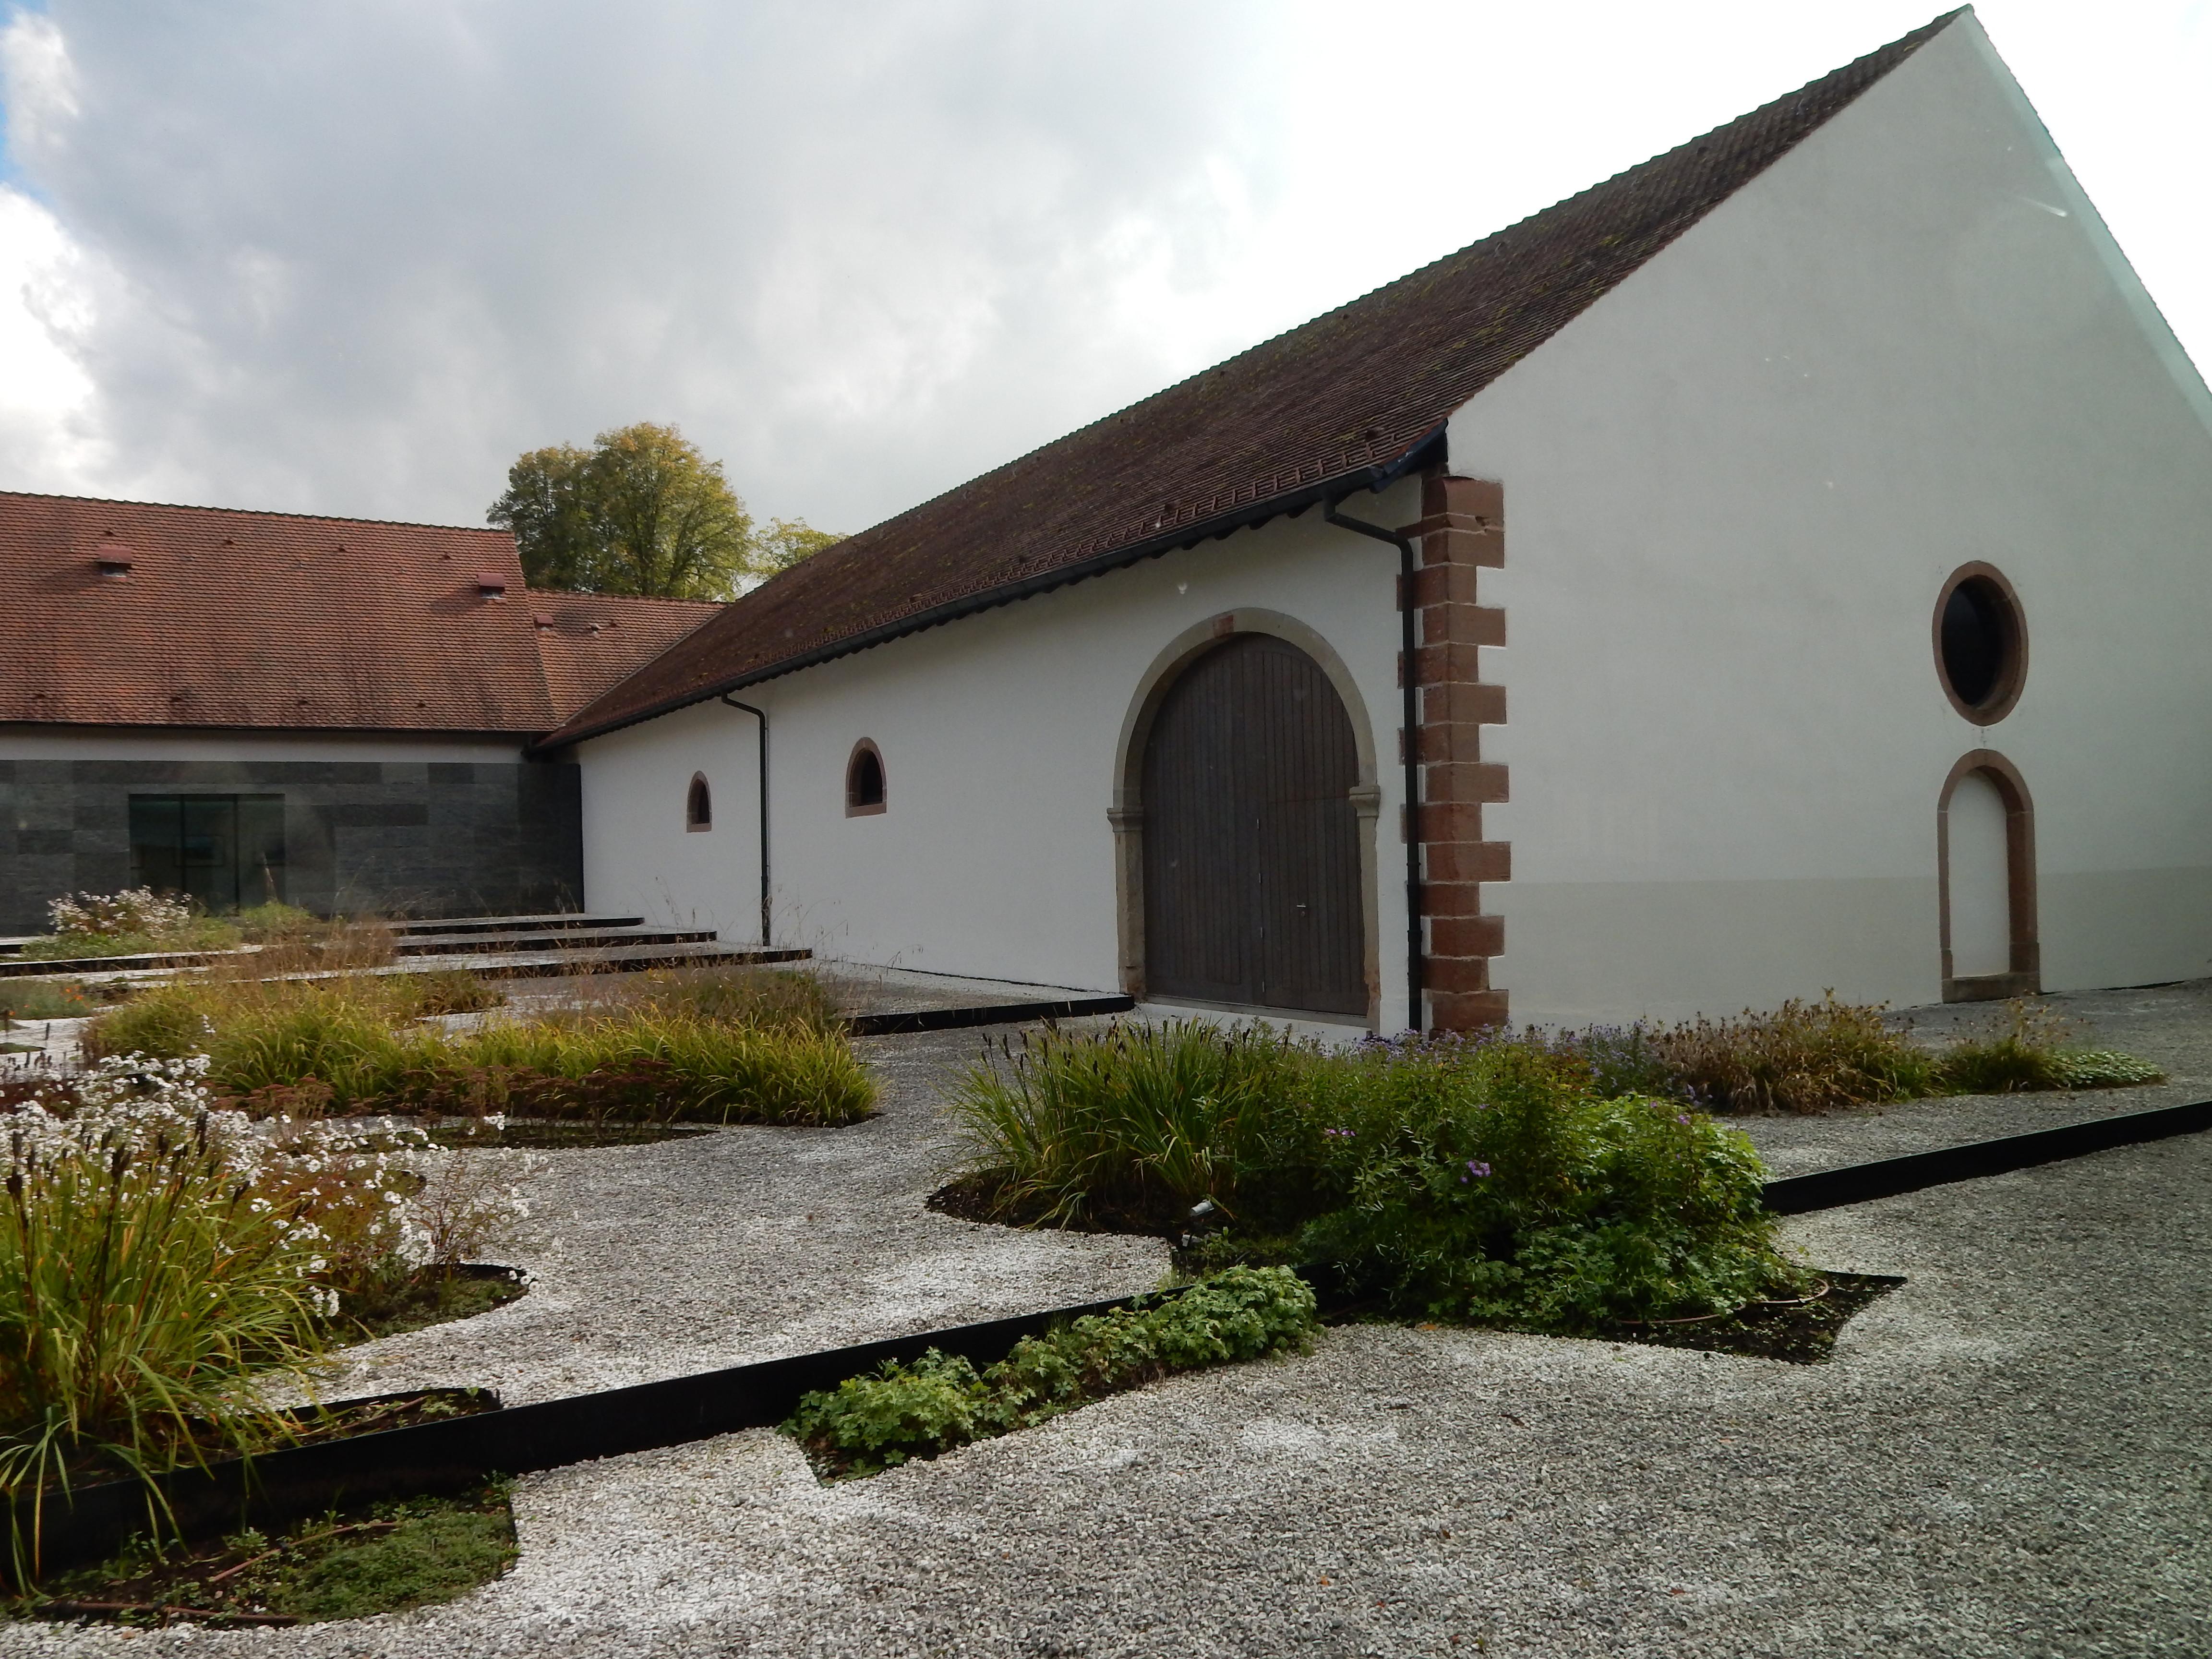 Musée Lalique, Wingen-sur-Moder, exterieur, tuin, binnenplaats